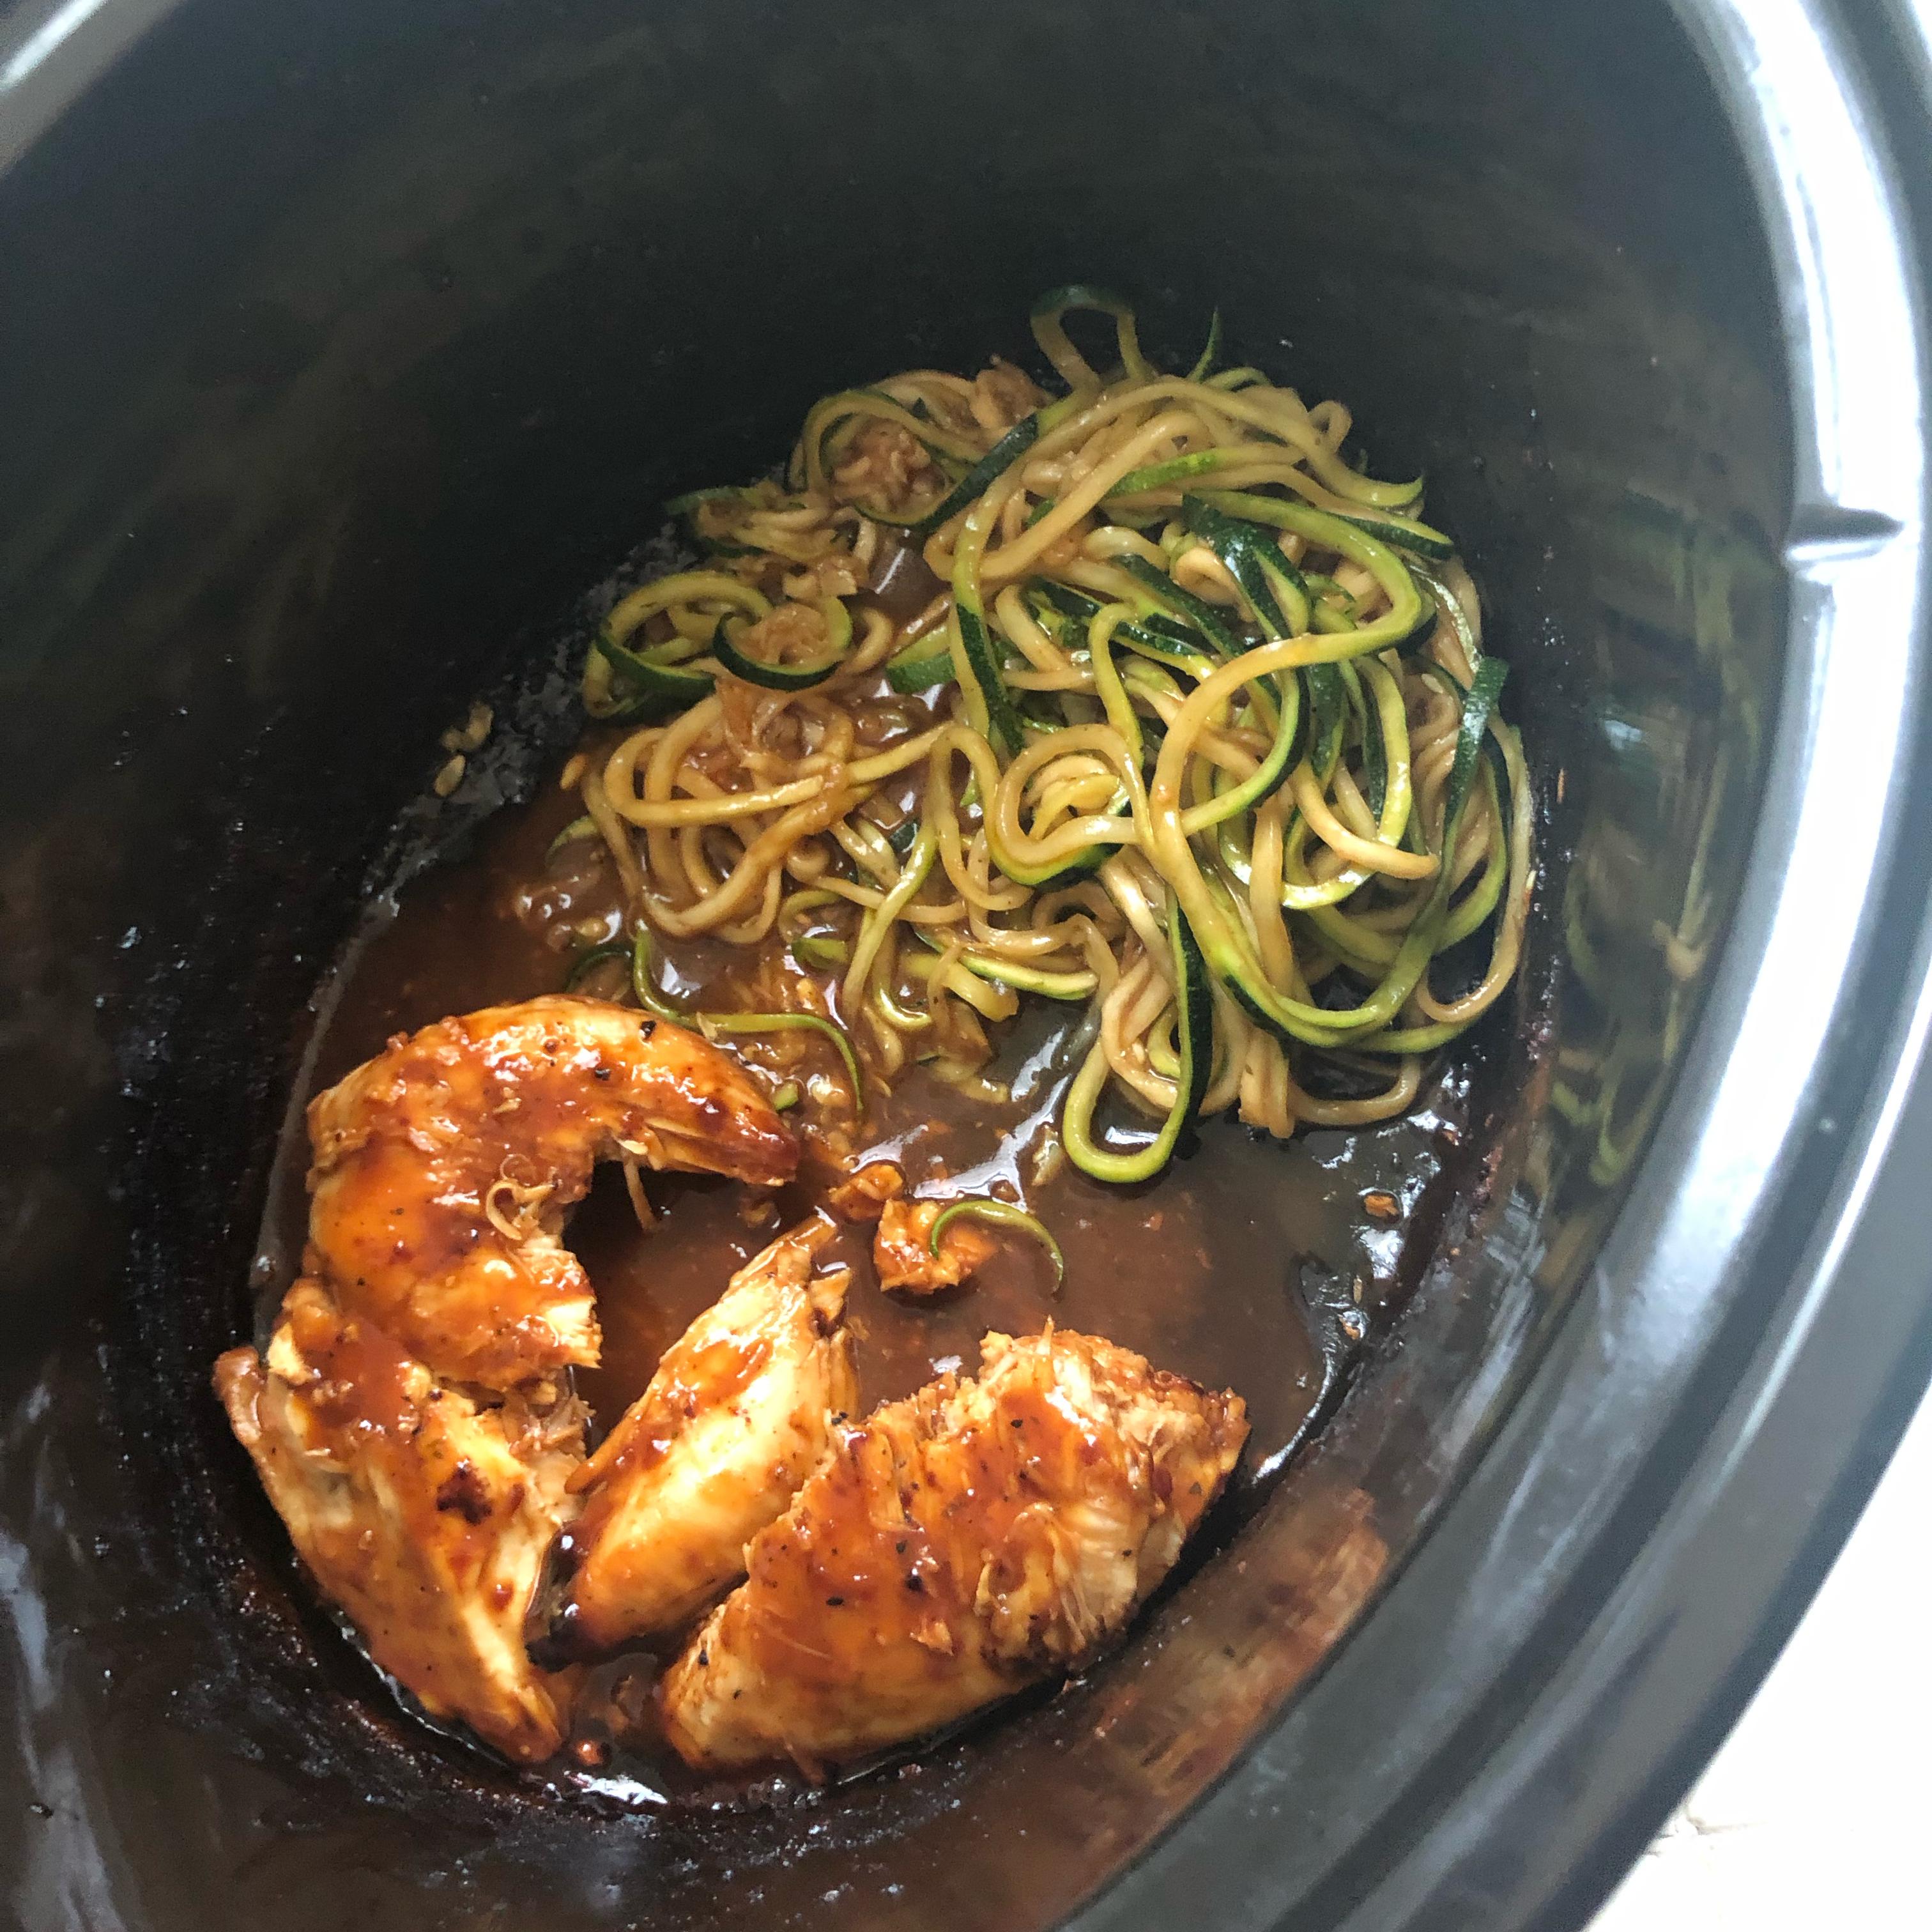 Zesty Slow Cooker Chicken Barbecue ChrisJames